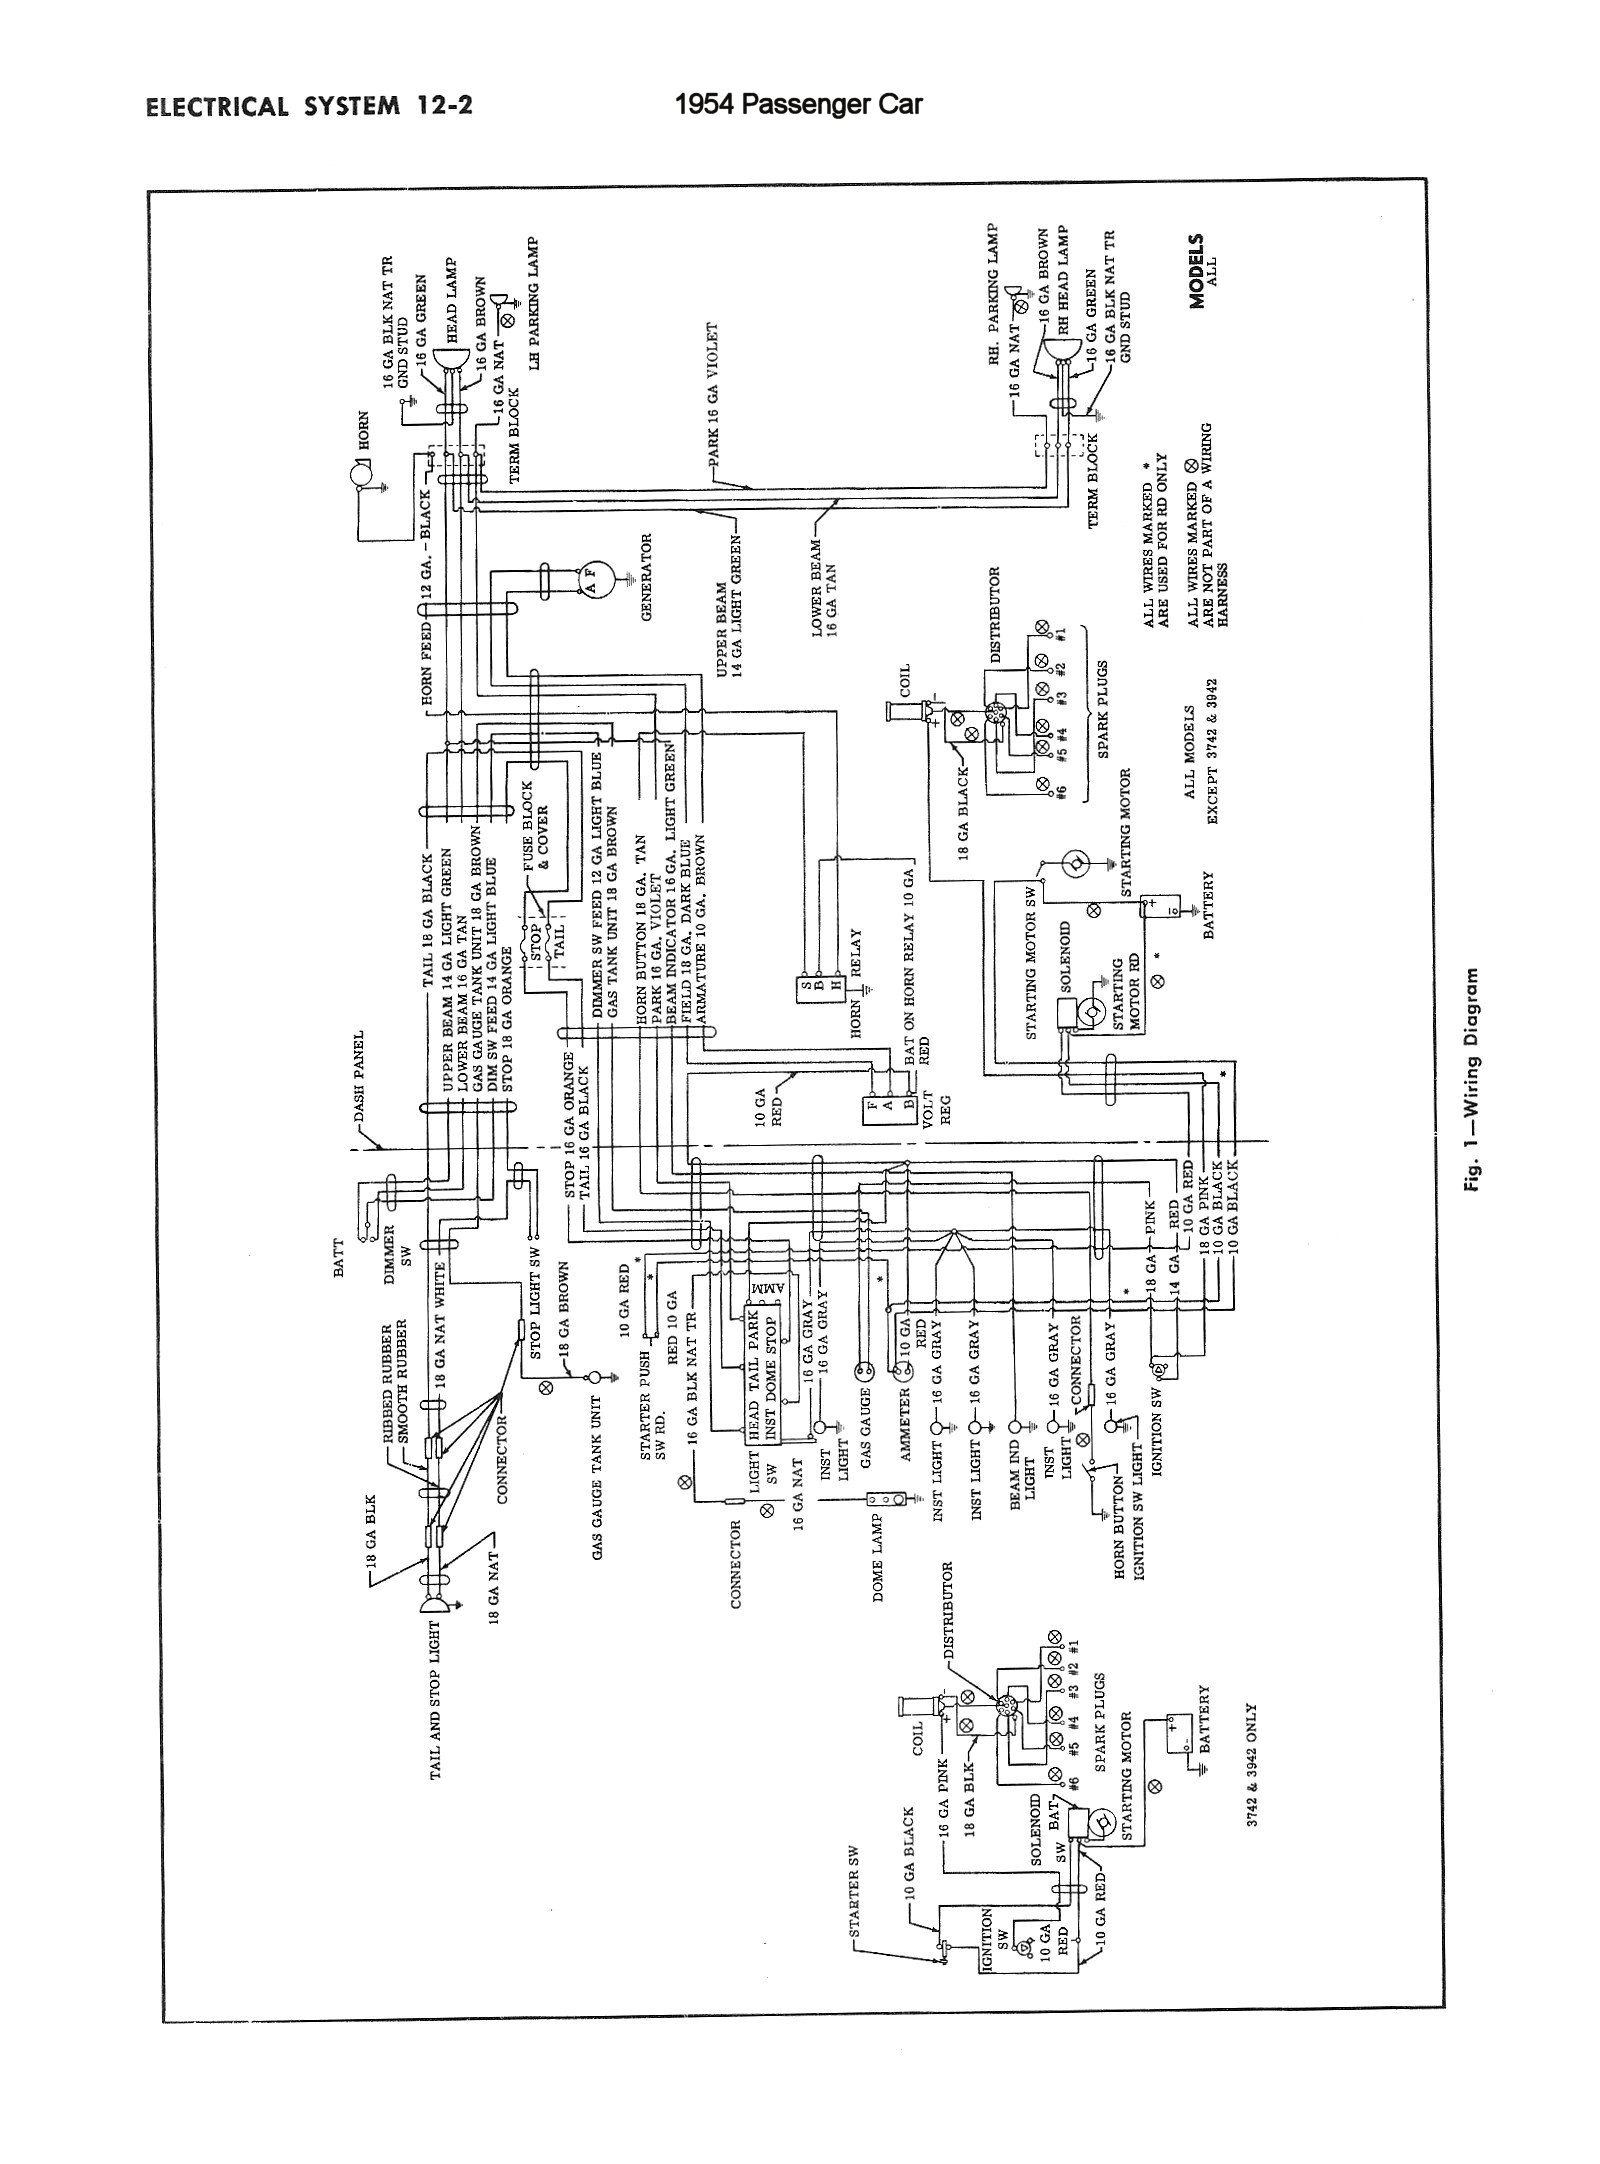 Chevy Pickup Wiring Diagram